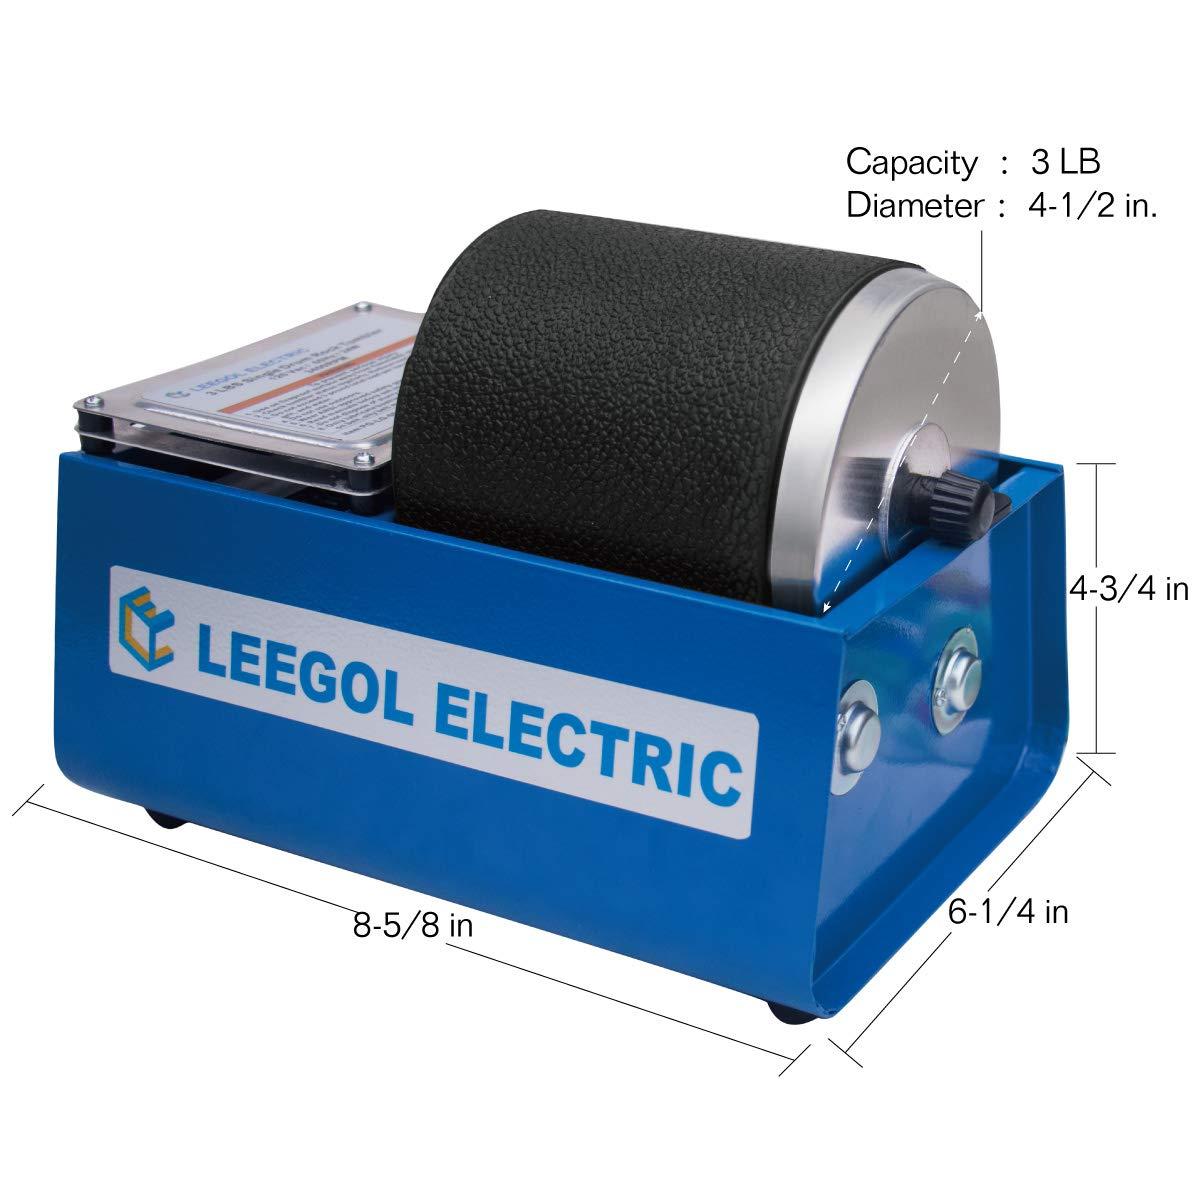 Leegol Electric Hobby Rock Tumbler Machine Single Drum 3LB Rotary Rock Polisher Single Barrel